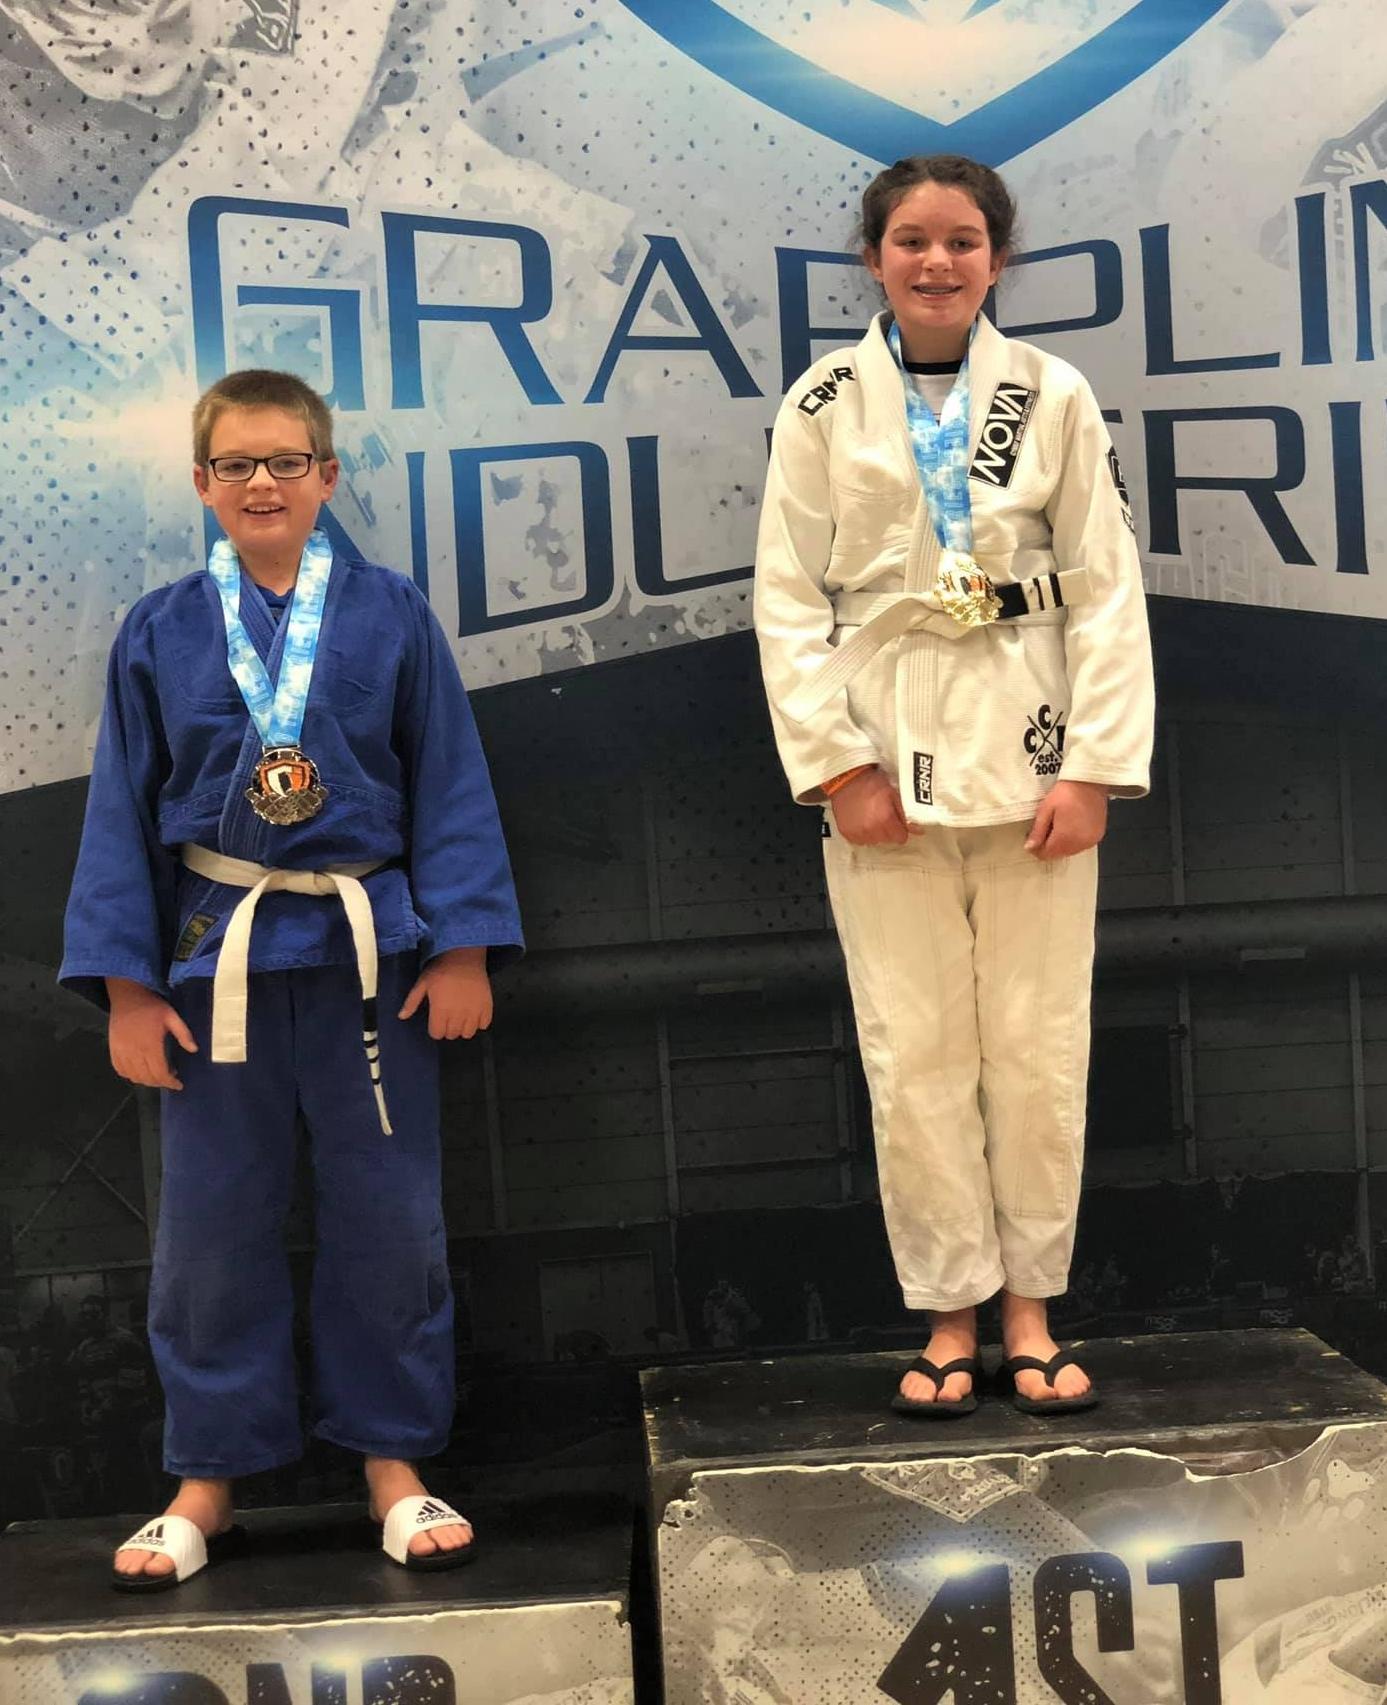 12 Year Old Raina from Pewaukee wins Gold this BJJ tournamnet.